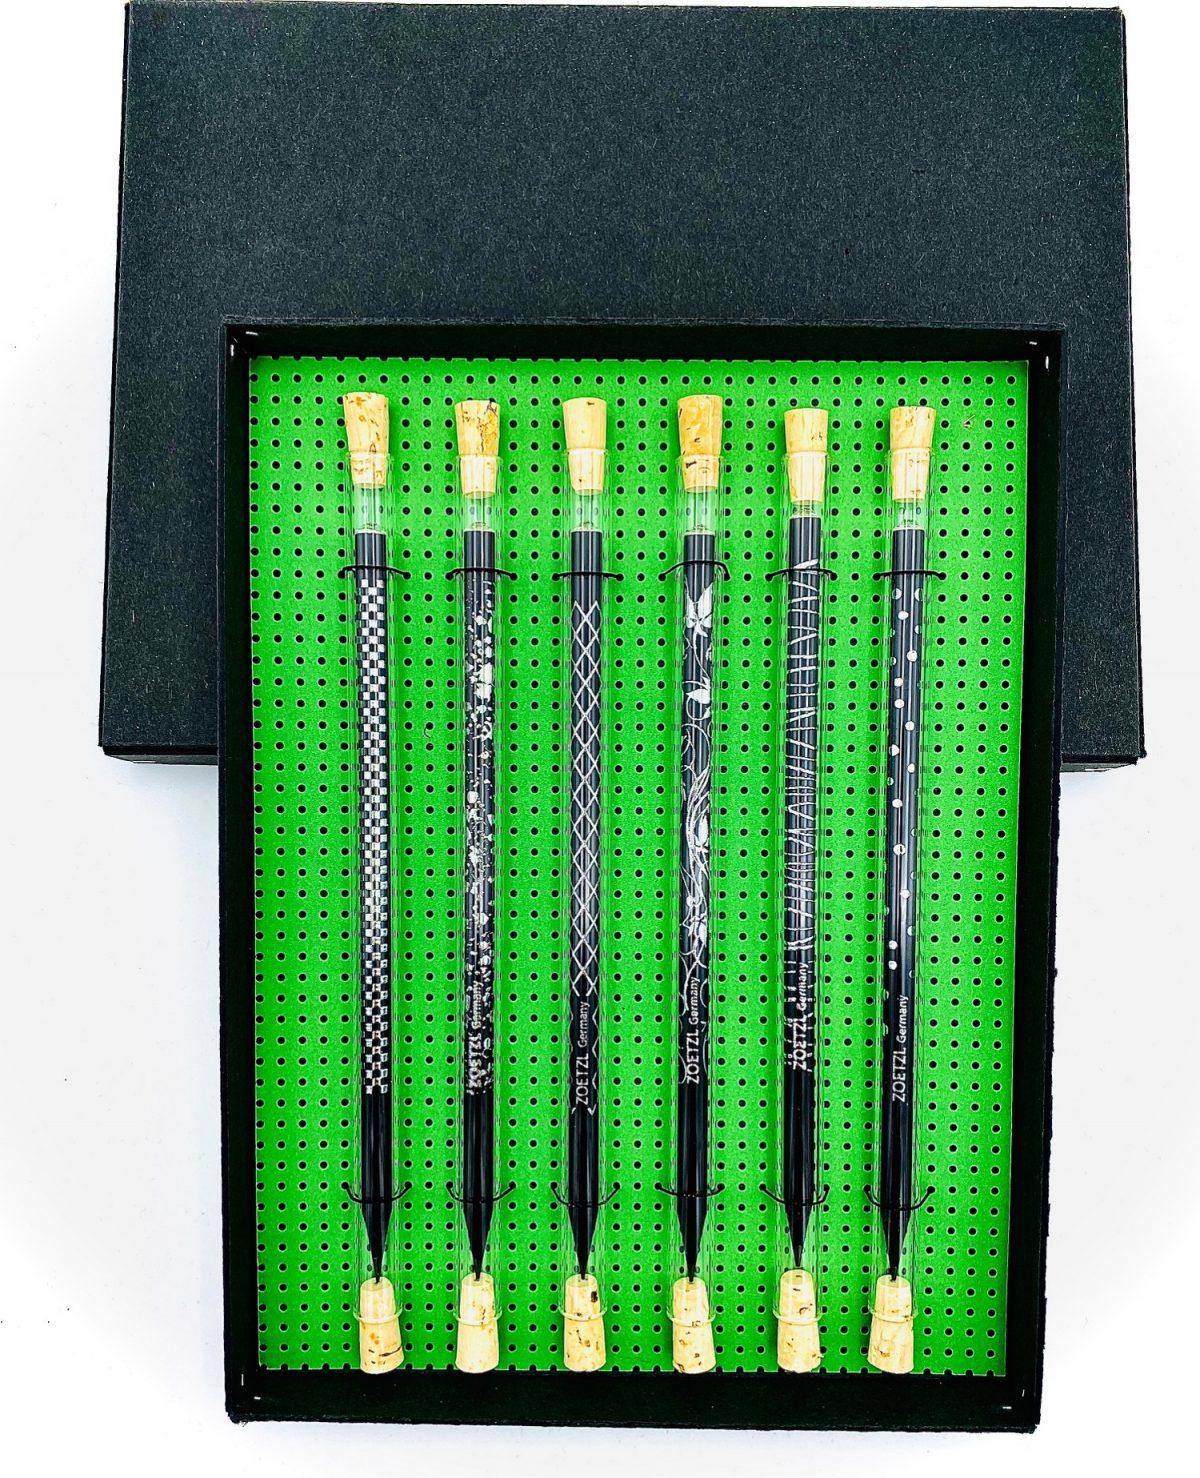 GS106  -  Trinkhalm & Pencil, Black & Silver